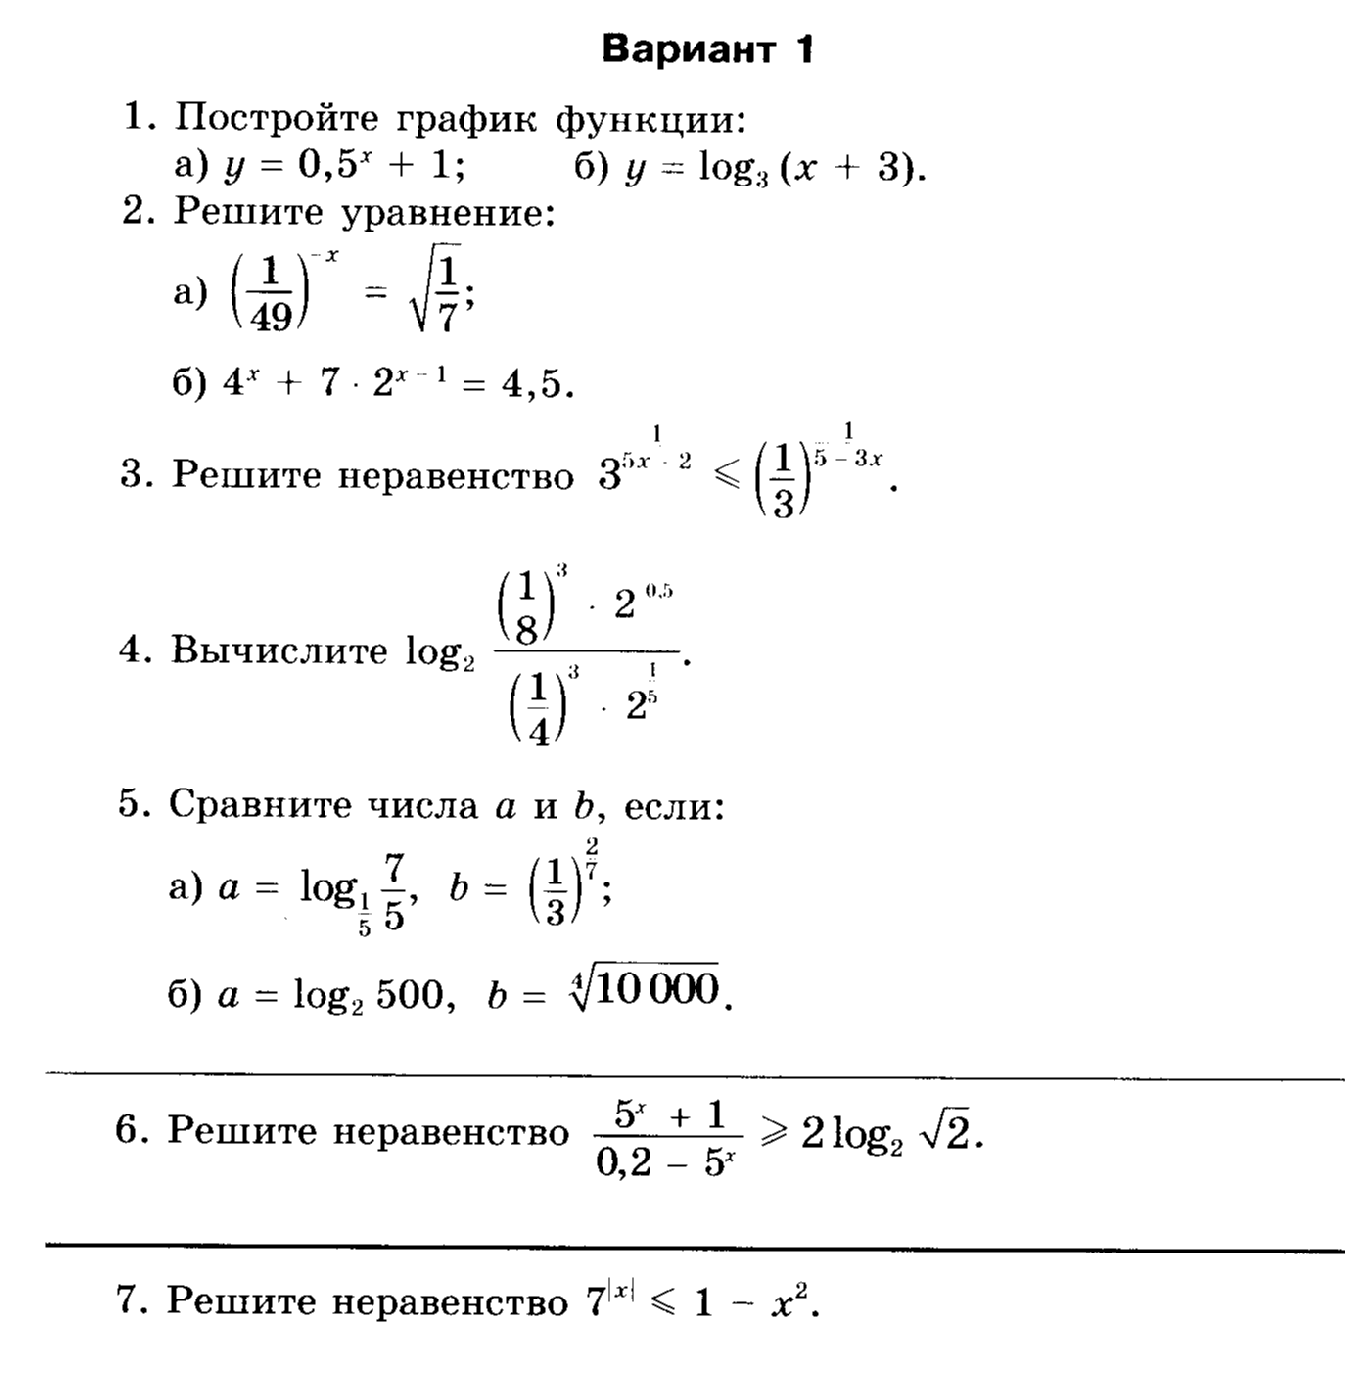 РАБОЧАЯ ПРОГРАММА по алгебре и началам анализа класс  hello html 29b82628 png hello html m7d848fed png